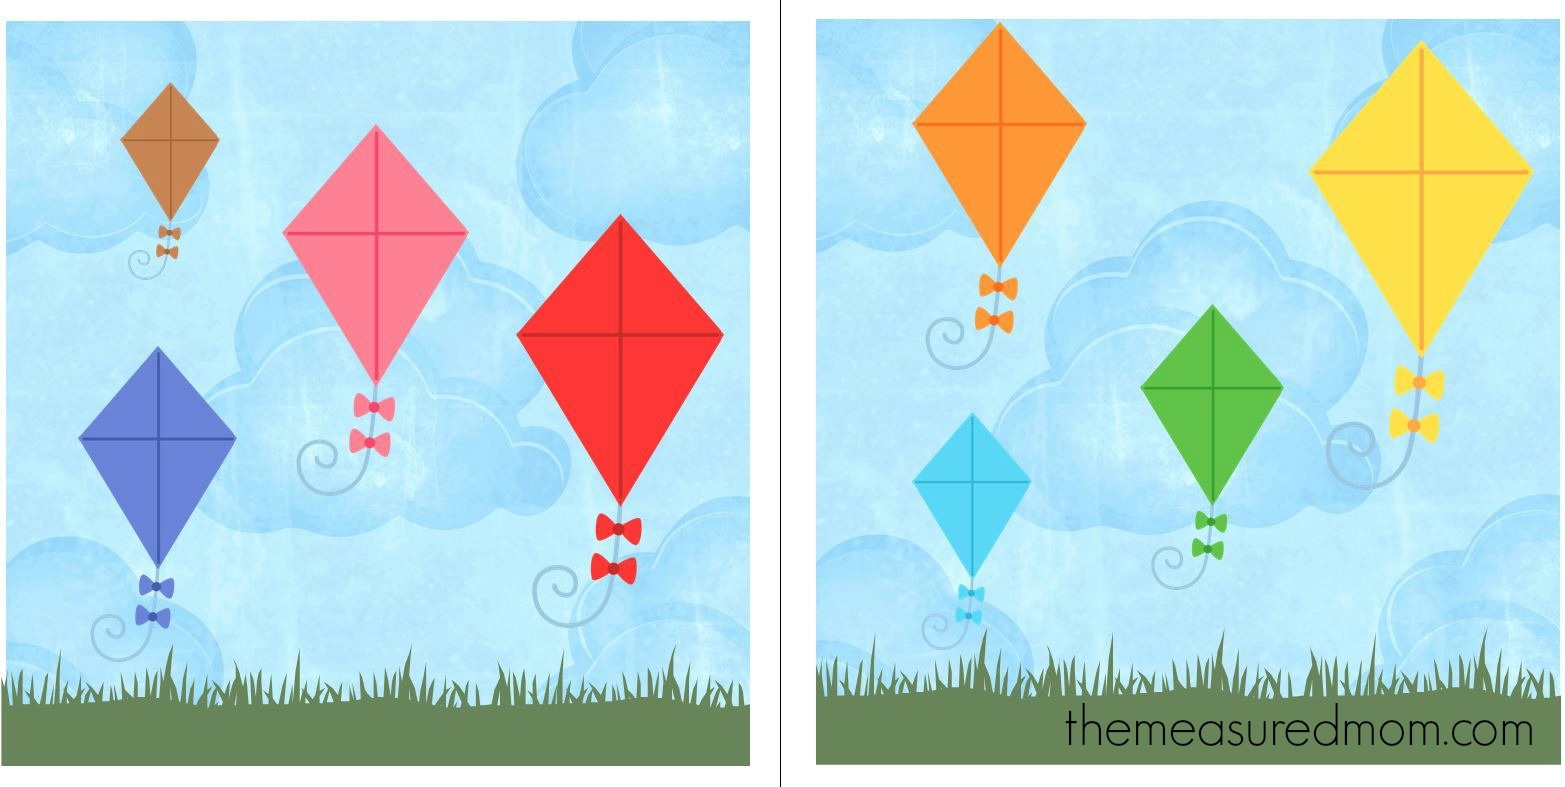 Free File Folder Game For Preschoolers: Kites! - The Measured Mom - Free Printable Math File Folder Games For Preschoolers